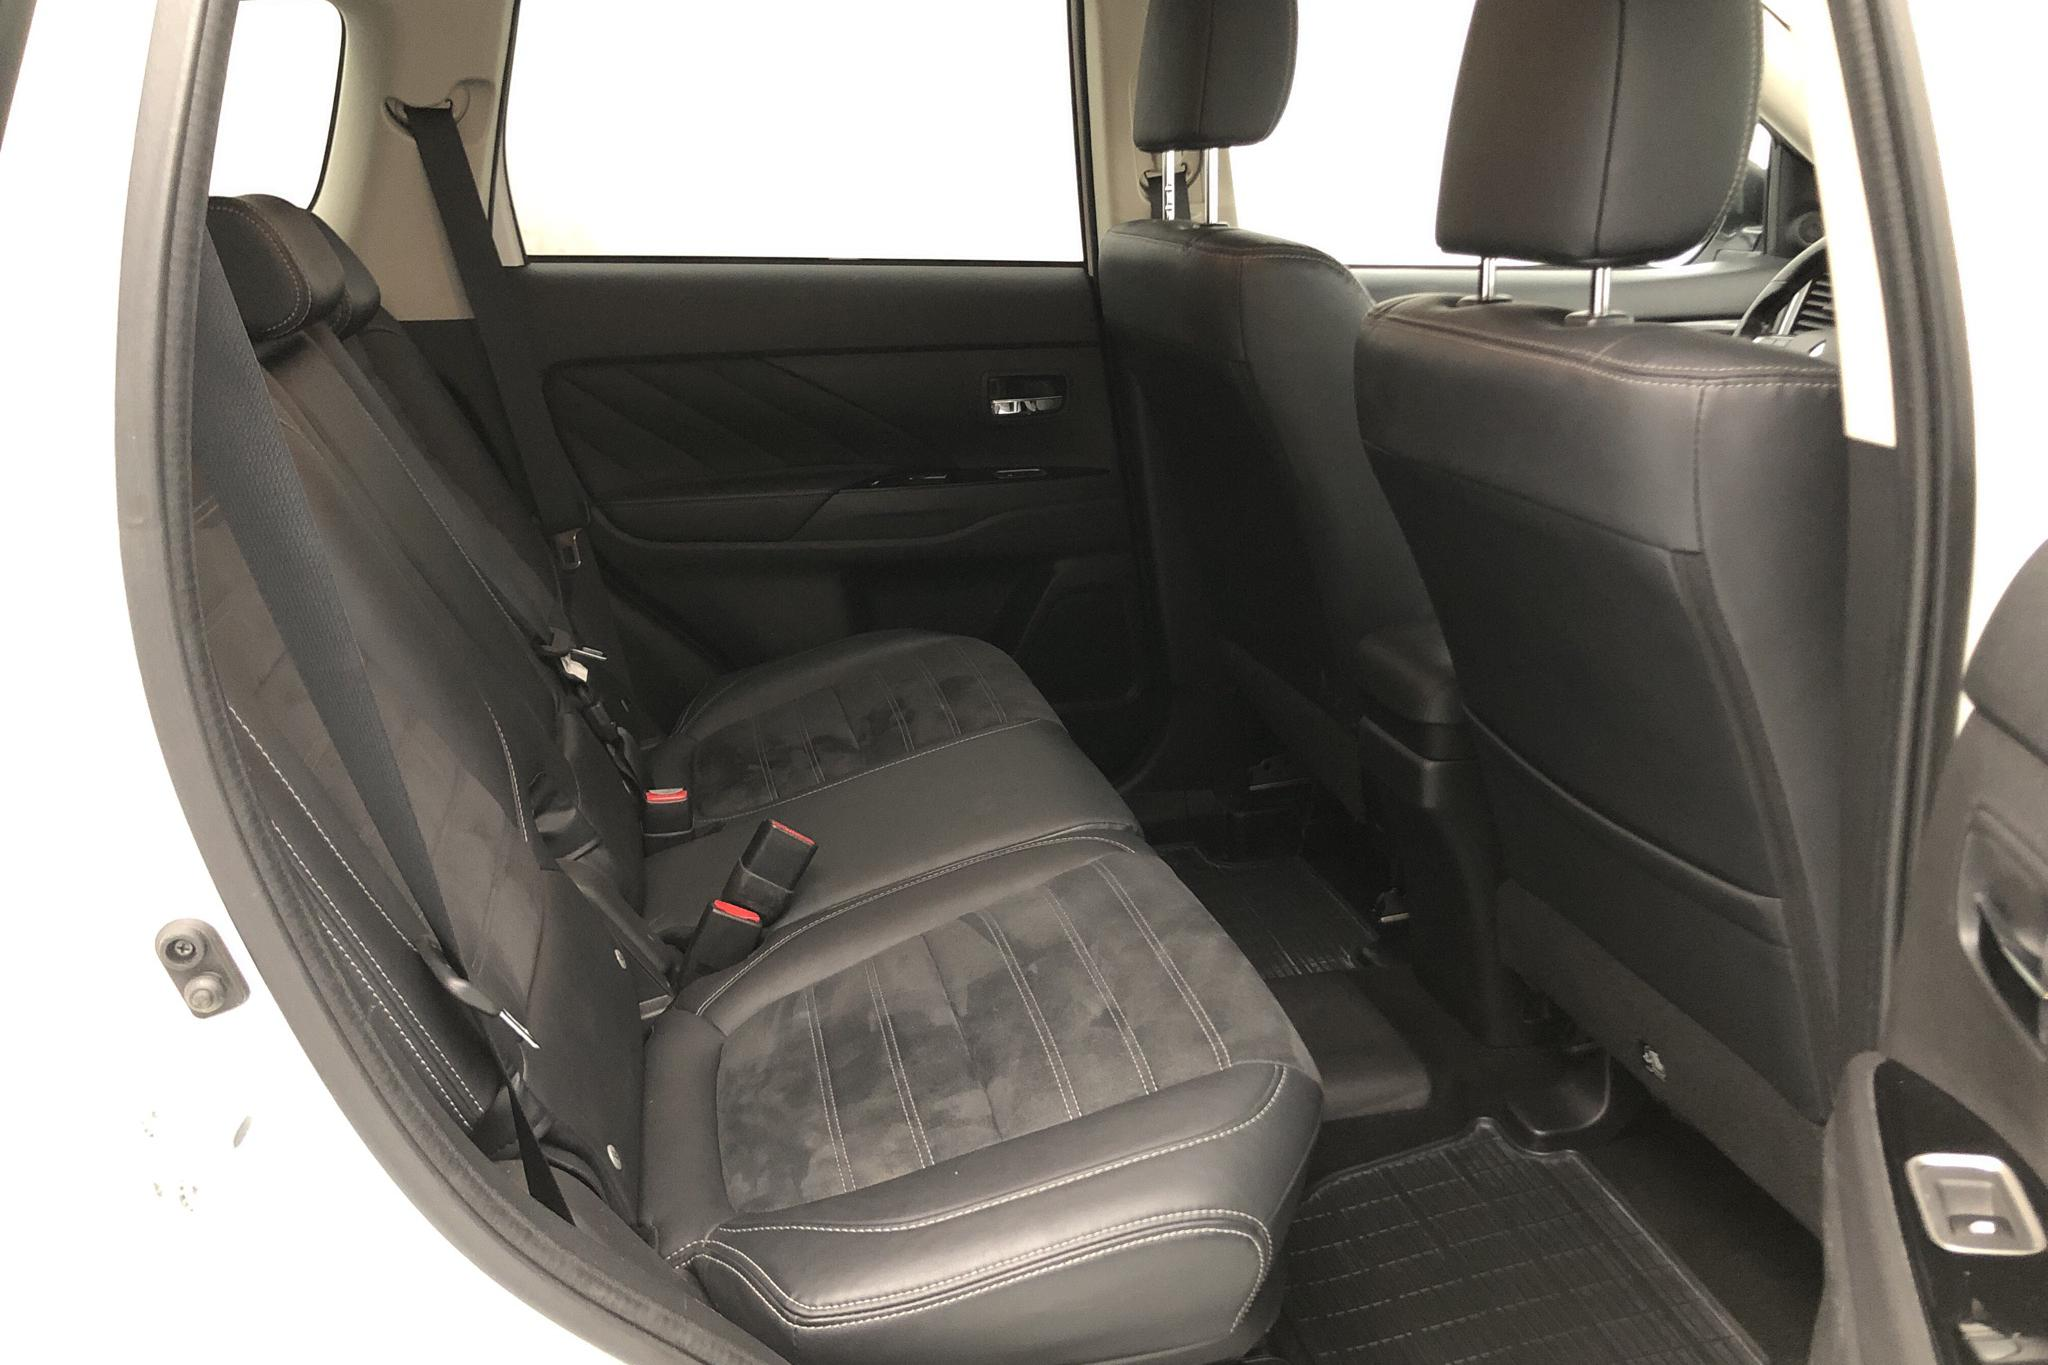 Mitsubishi Outlander 2.0 Plug-in Hybrid 4WD (121hk) - 10 270 mil - Automat - vit - 2016